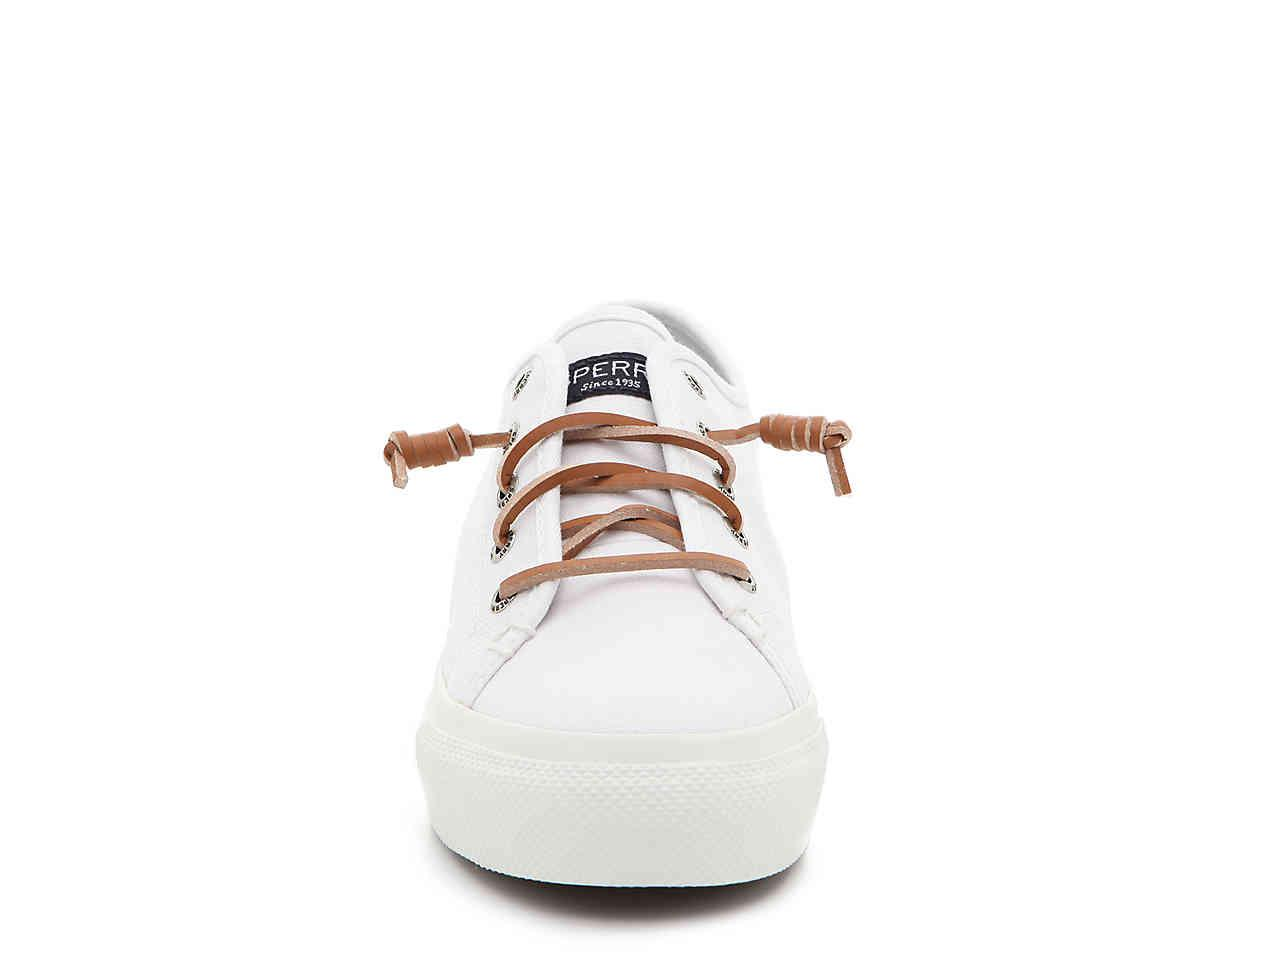 1634a0203f6 Lyst - Sperry Top-Sider Cliffside Platform Slip-on Sneaker in White ...